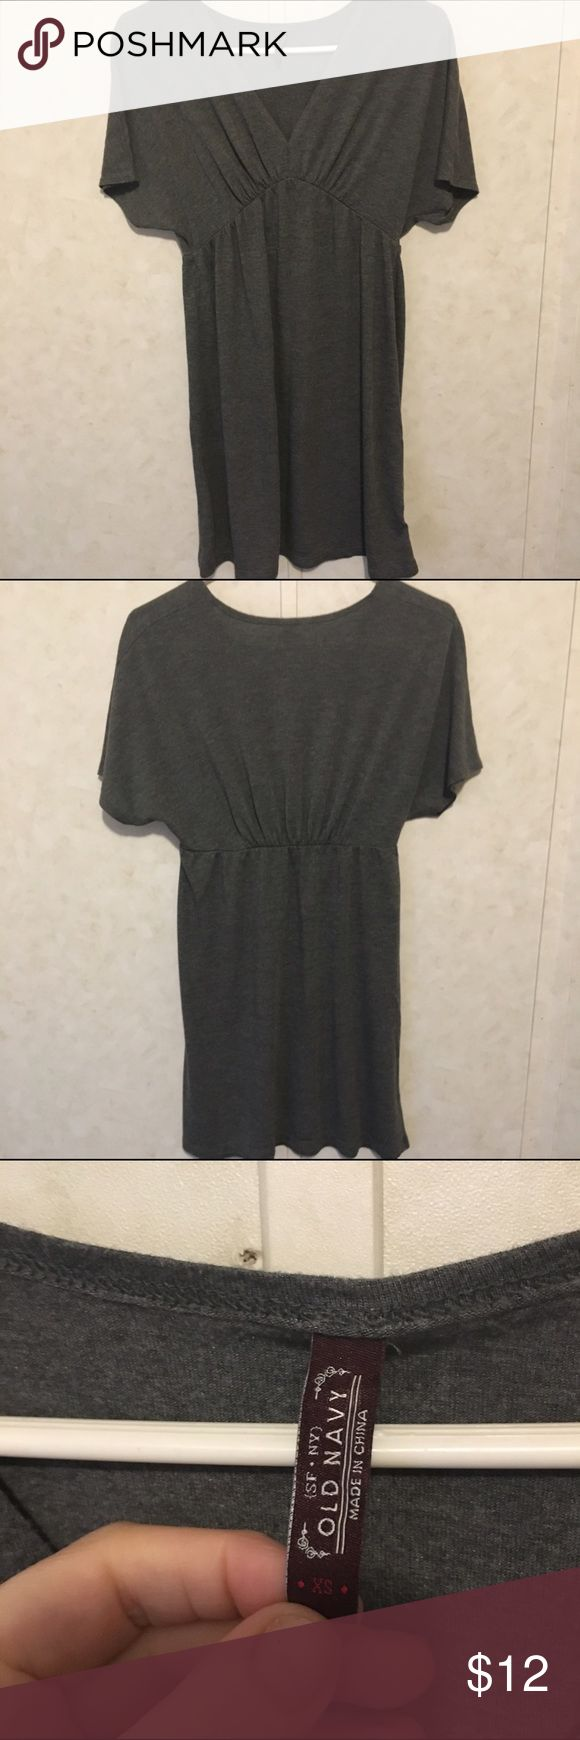 Old Navy mini dress Super soft jersey knit empire waist dress Old Navy Dresses Mini